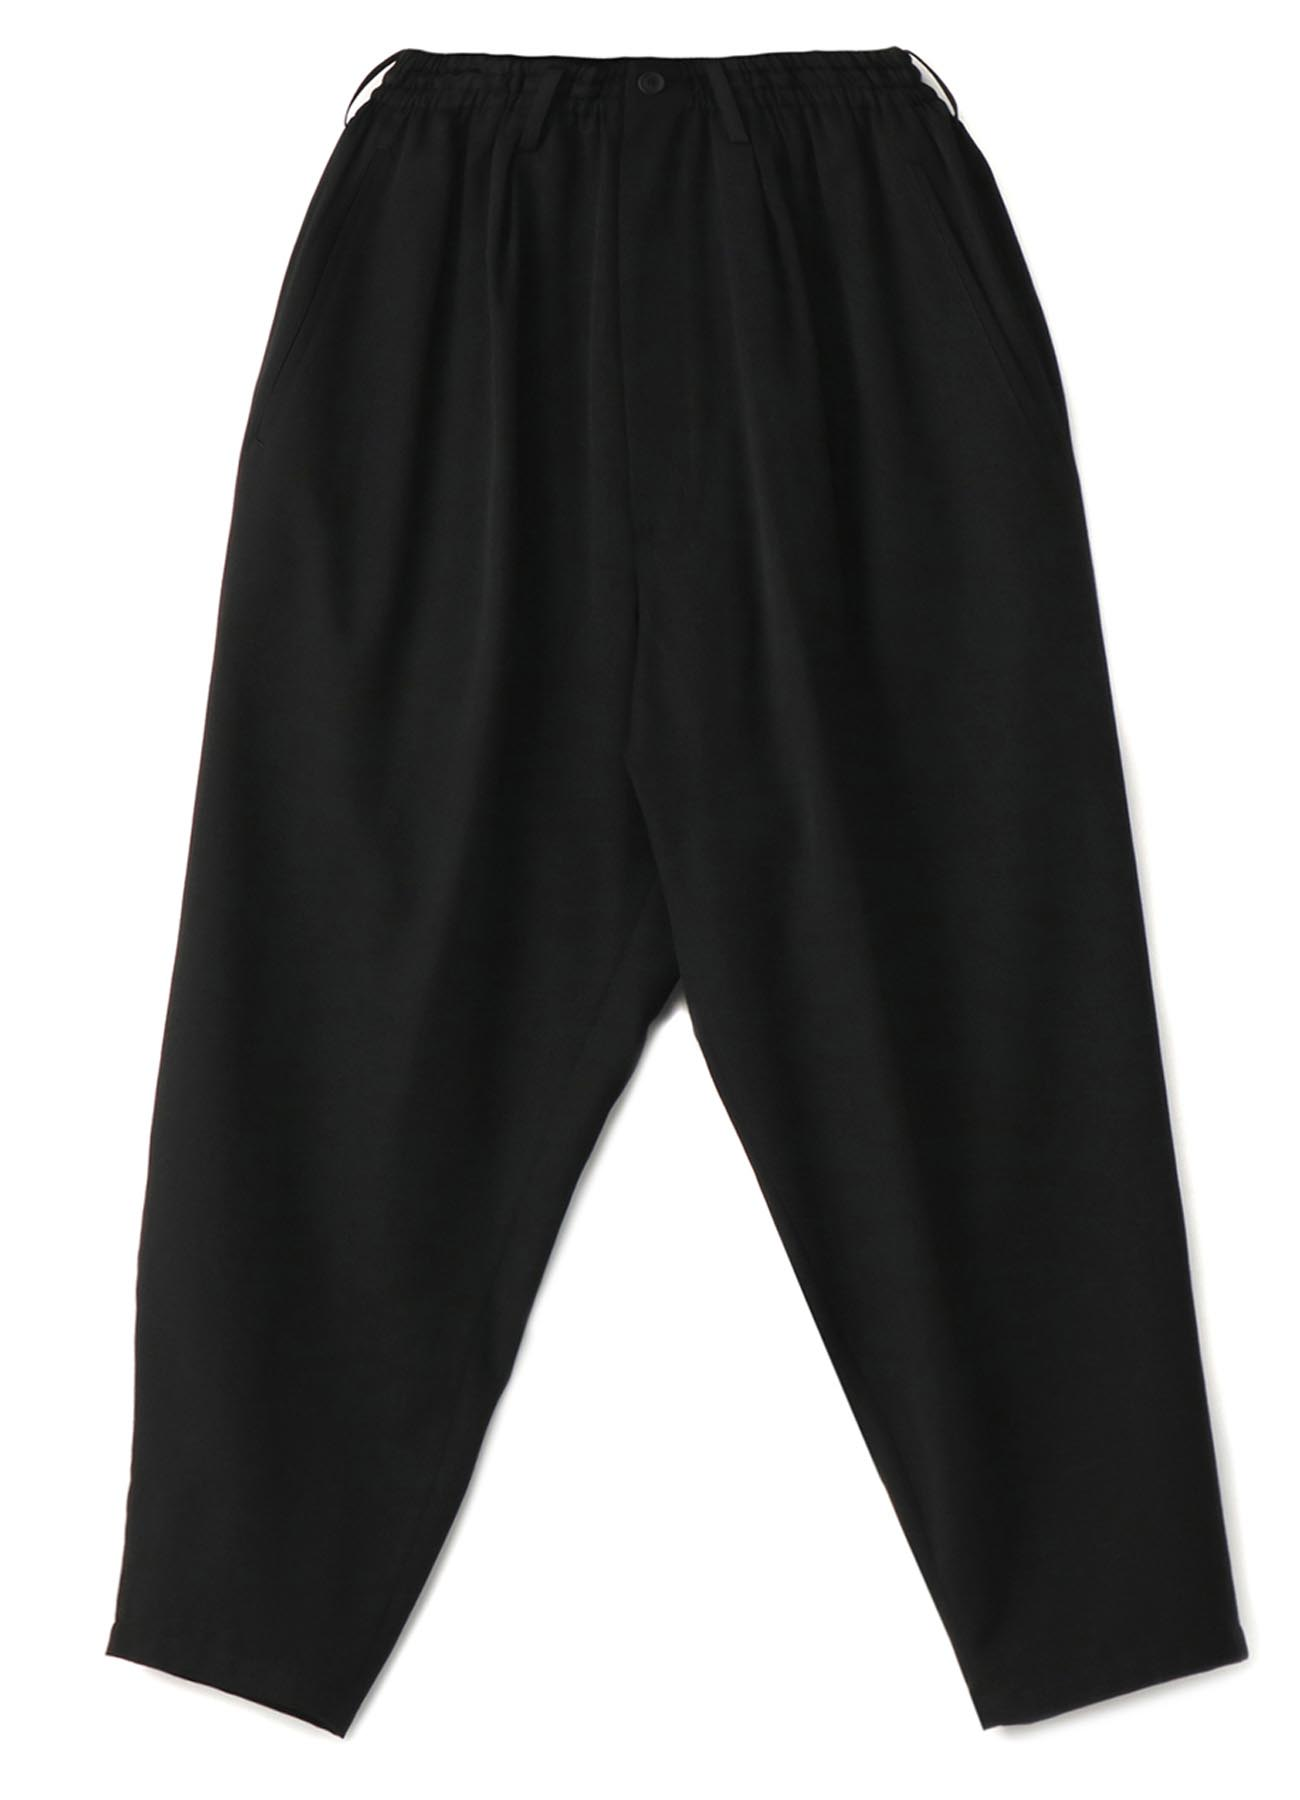 W/GABARDINE STRING PANTS